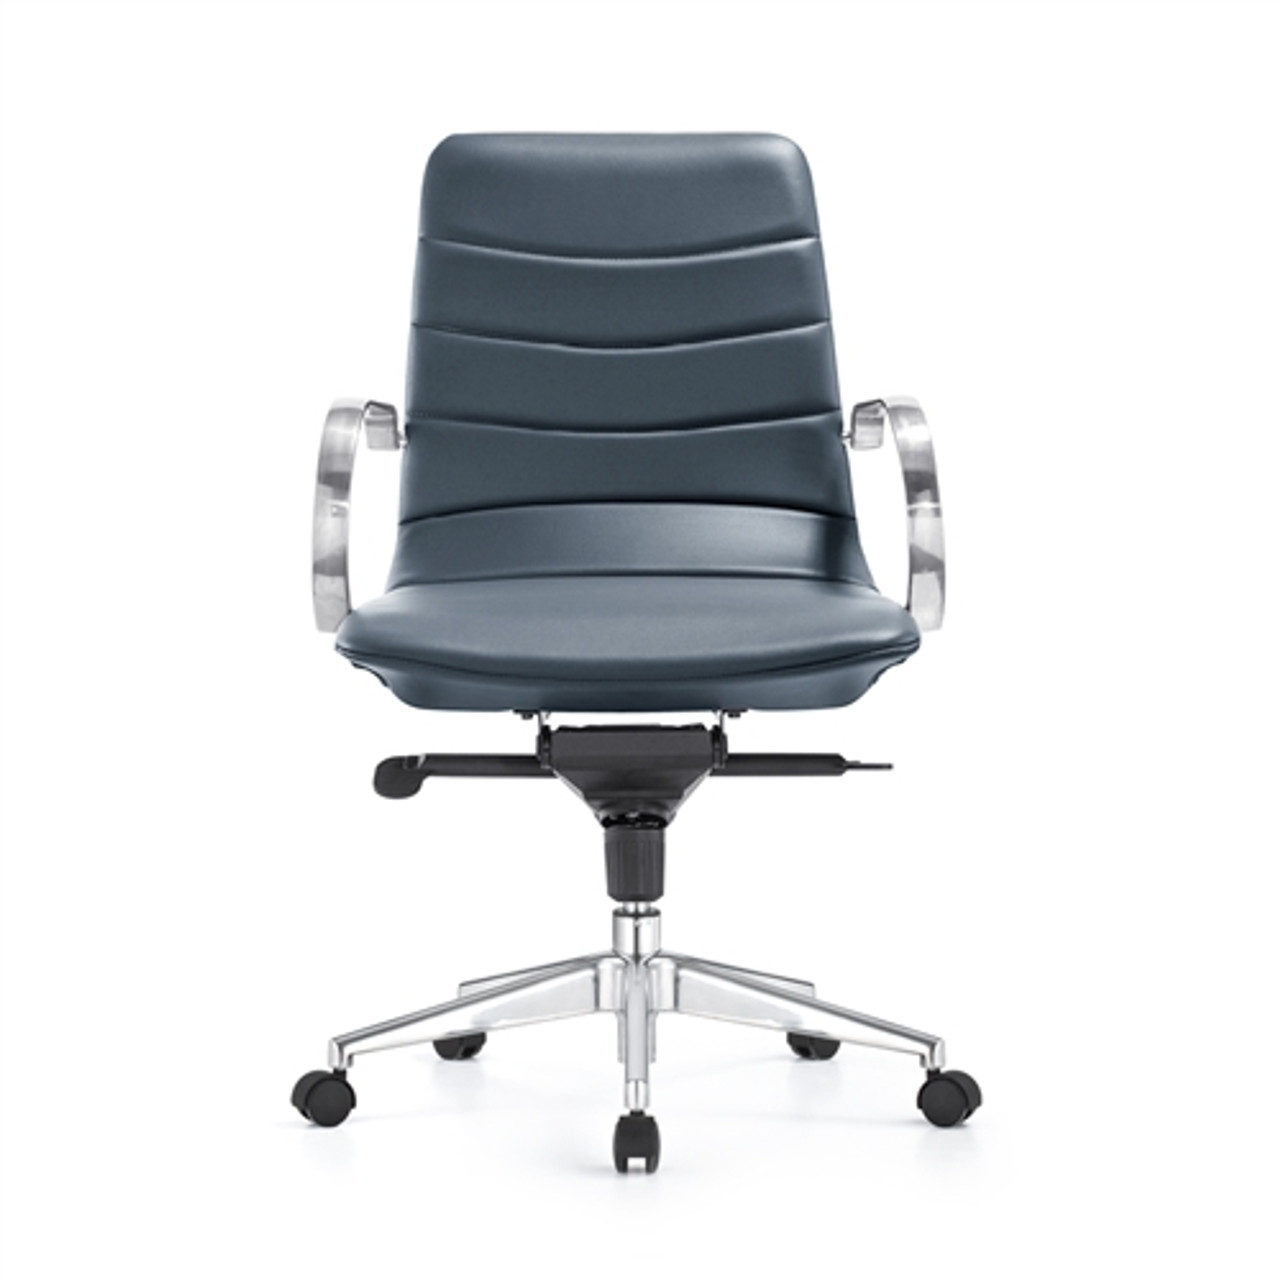 Woodstock Marie Mid Century Modern Office Chair